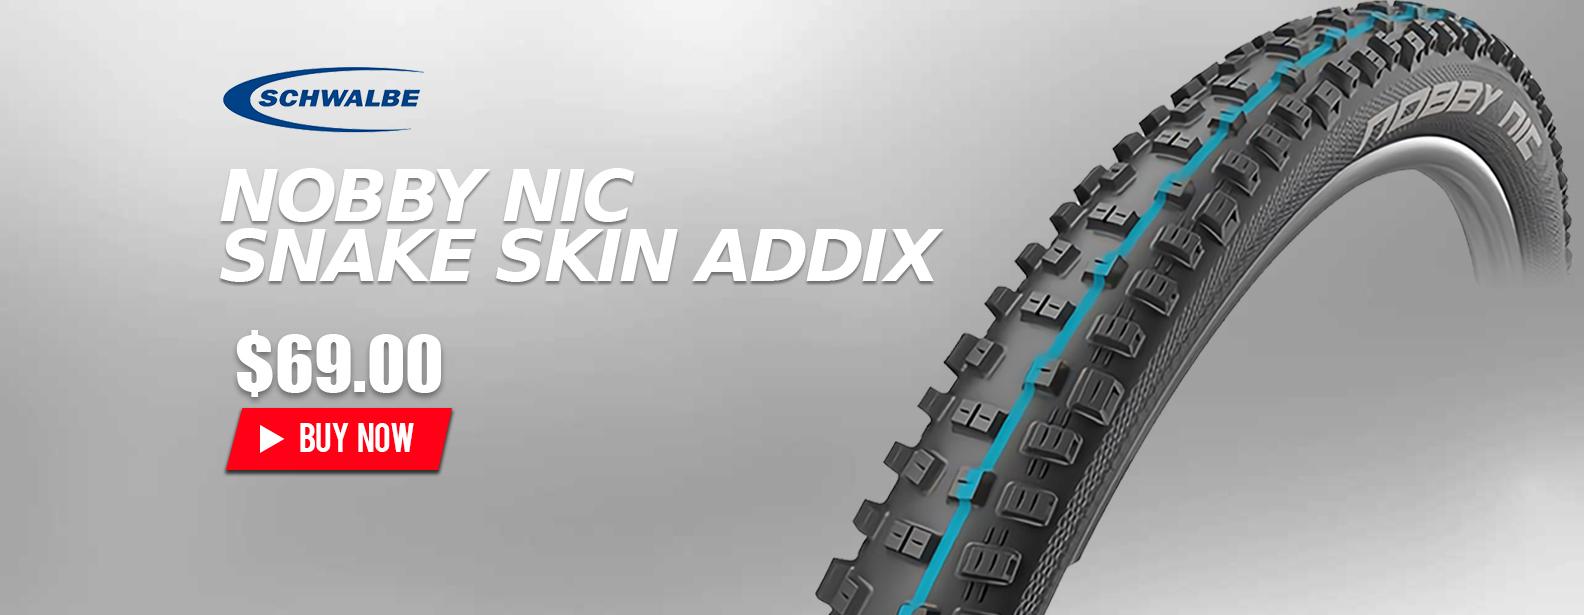 Schwalbe Nobby Nic 27.5x2.6 SnakeSkin Addix Speedgrip Tire